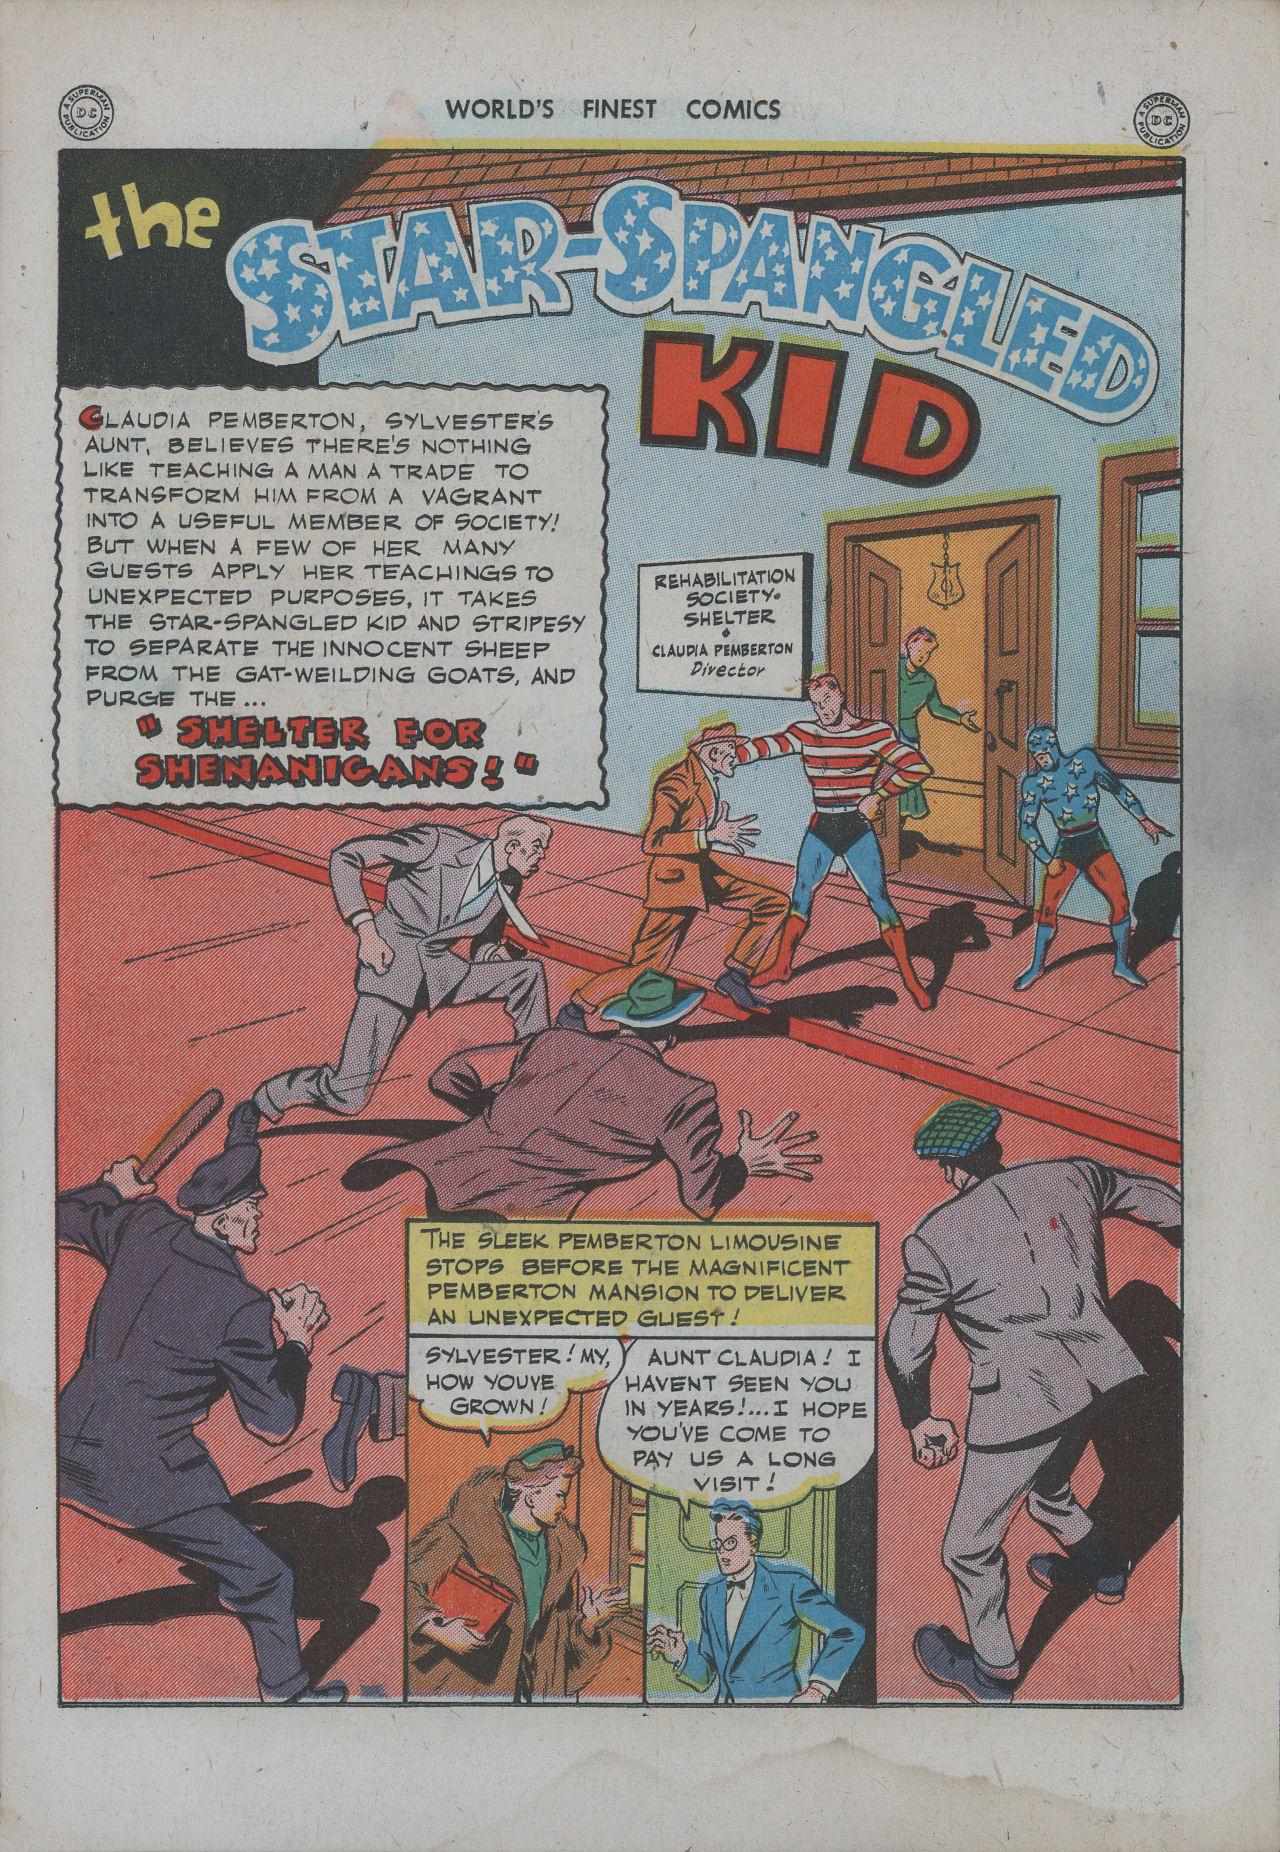 Read online World's Finest Comics comic -  Issue #15 - 17